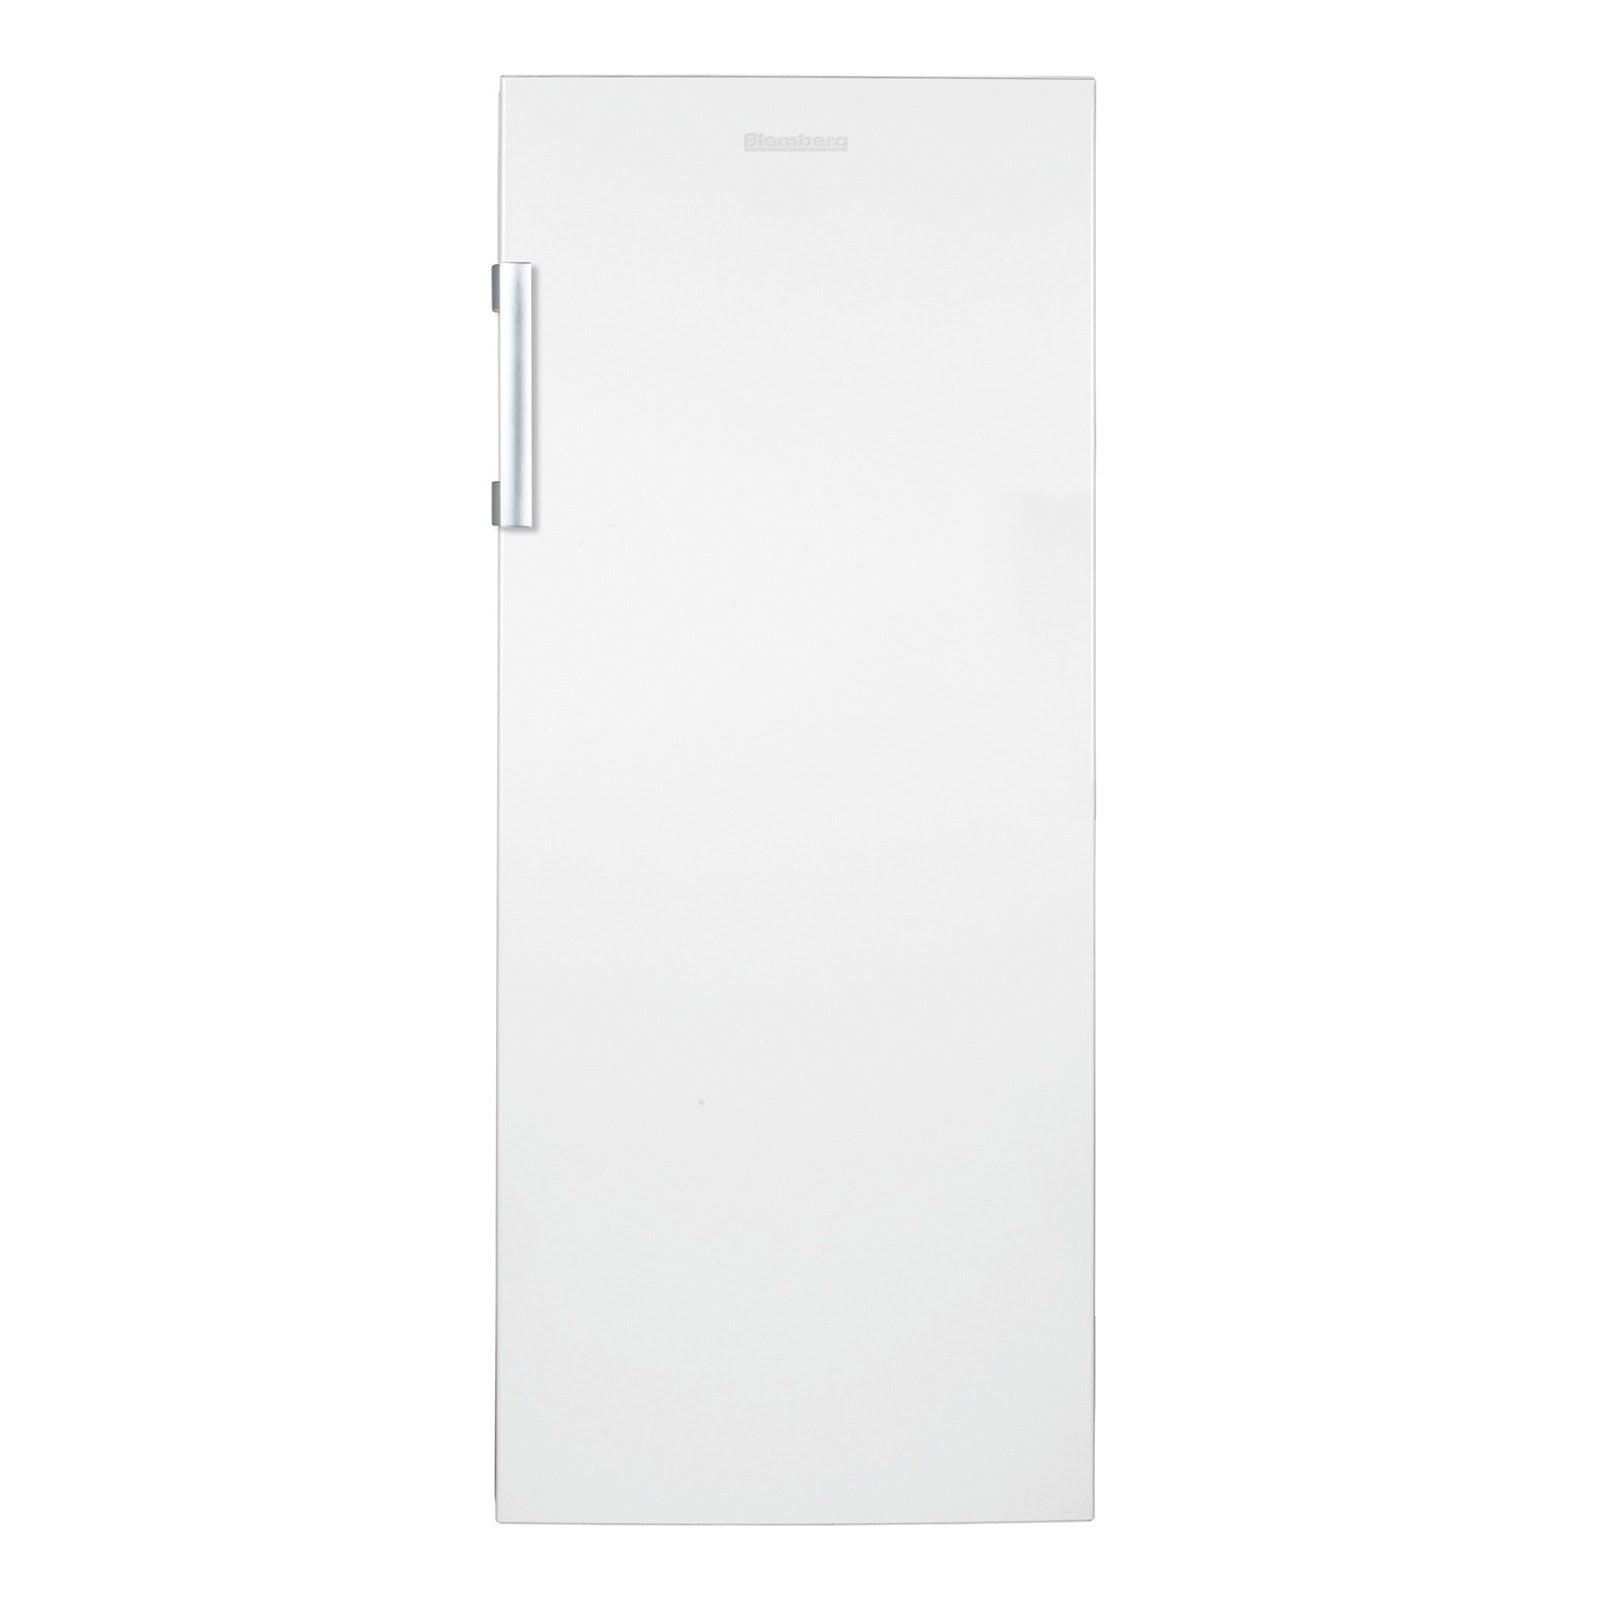 Blomberg Ssm4450 Tall Larder Fridge In White 1 46m A 3yr